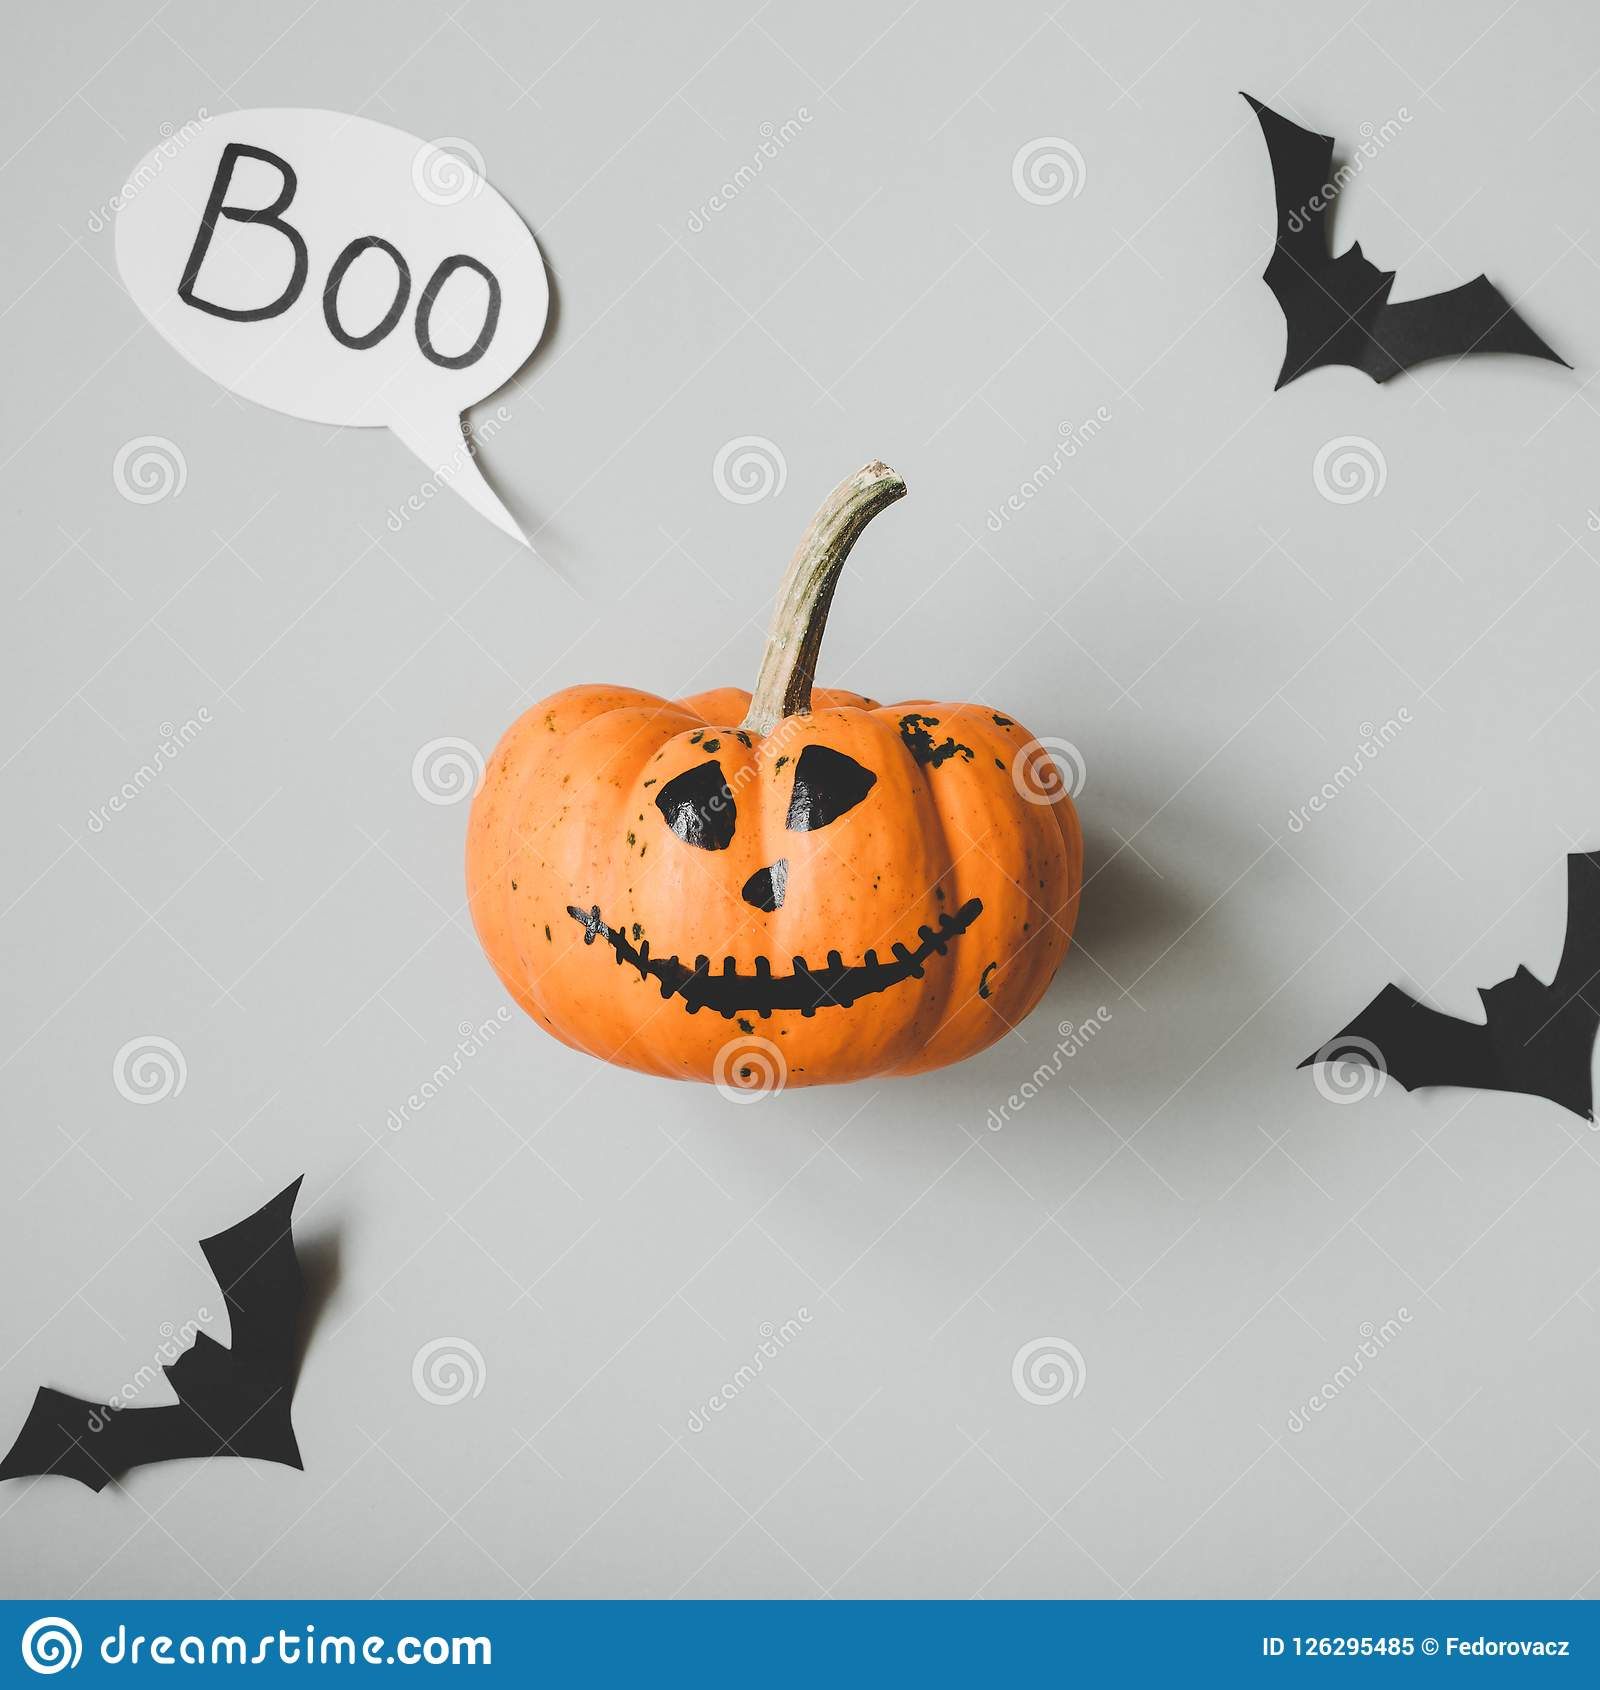 happy halloween. funny halloween pumpkin with speech bubble and